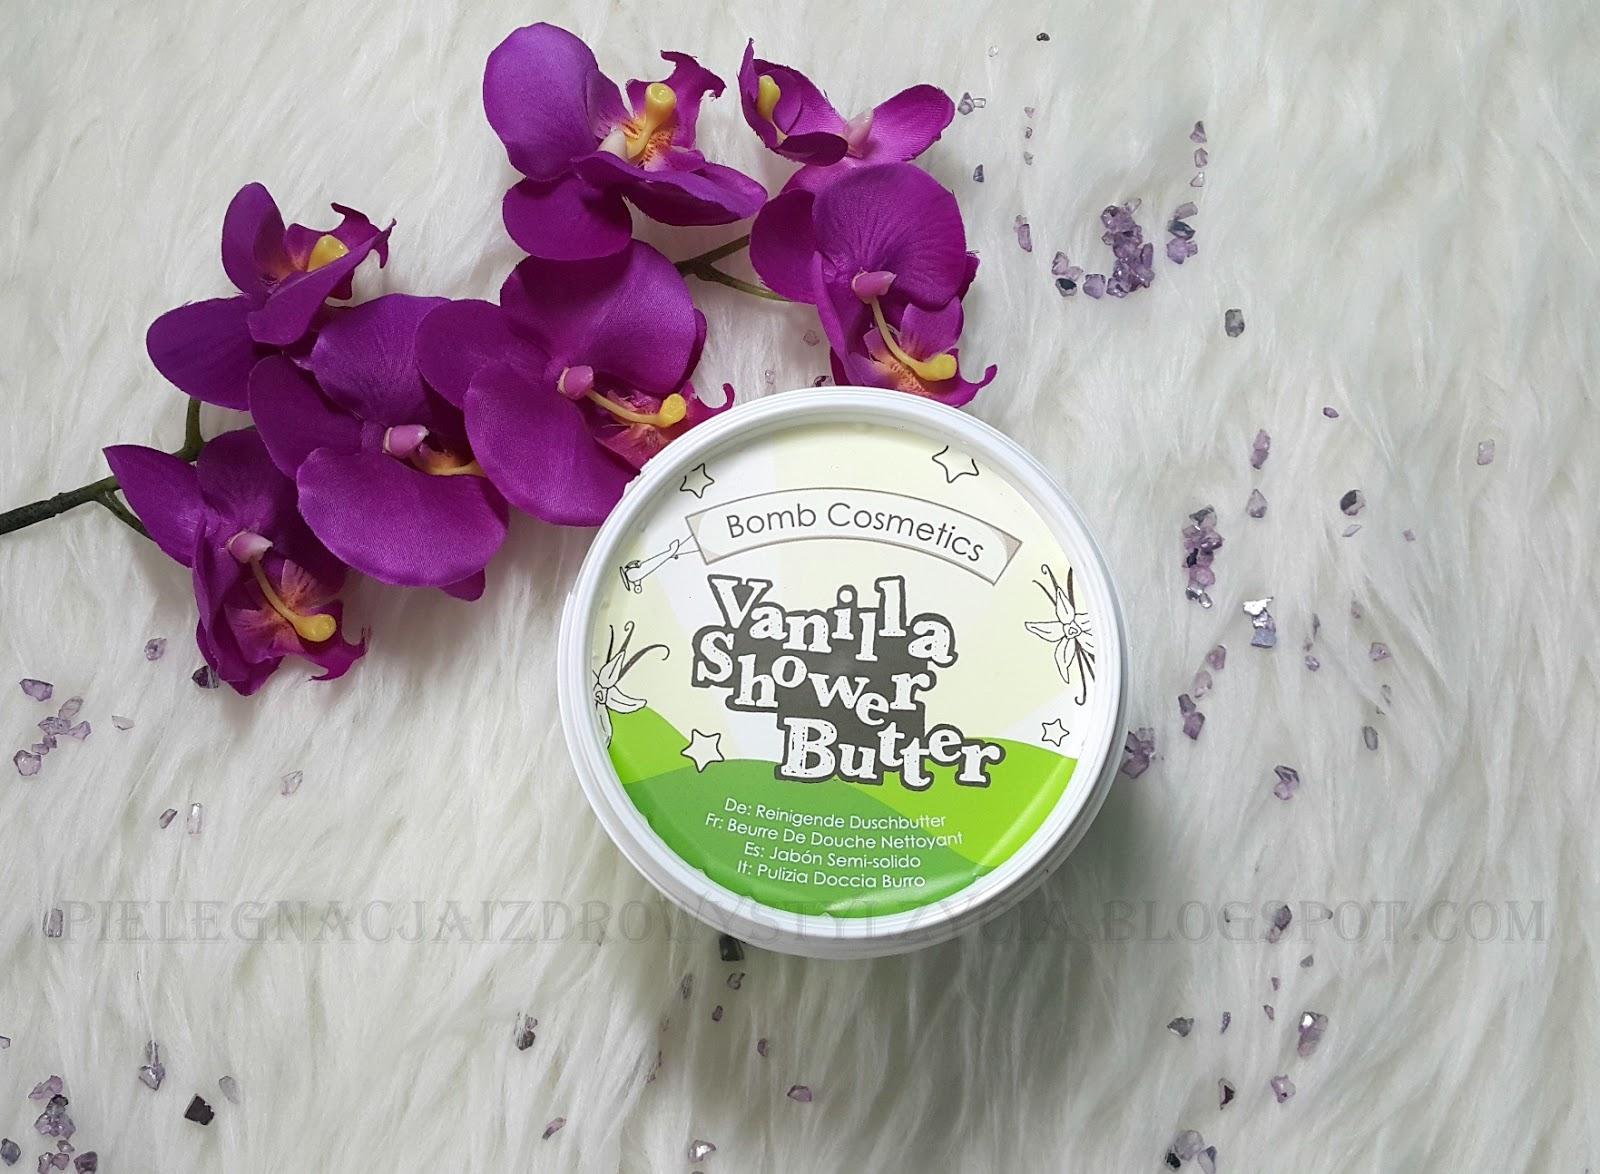 Myjące masło pod prysznic Bomb Cosmetics Vanilla Shower Butter